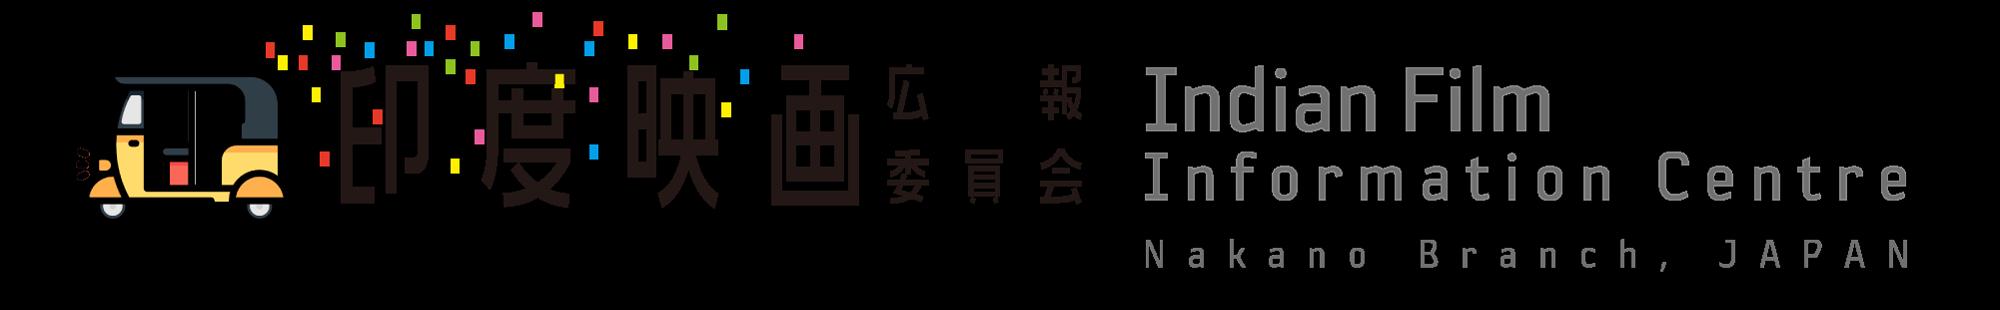 IFIC logo